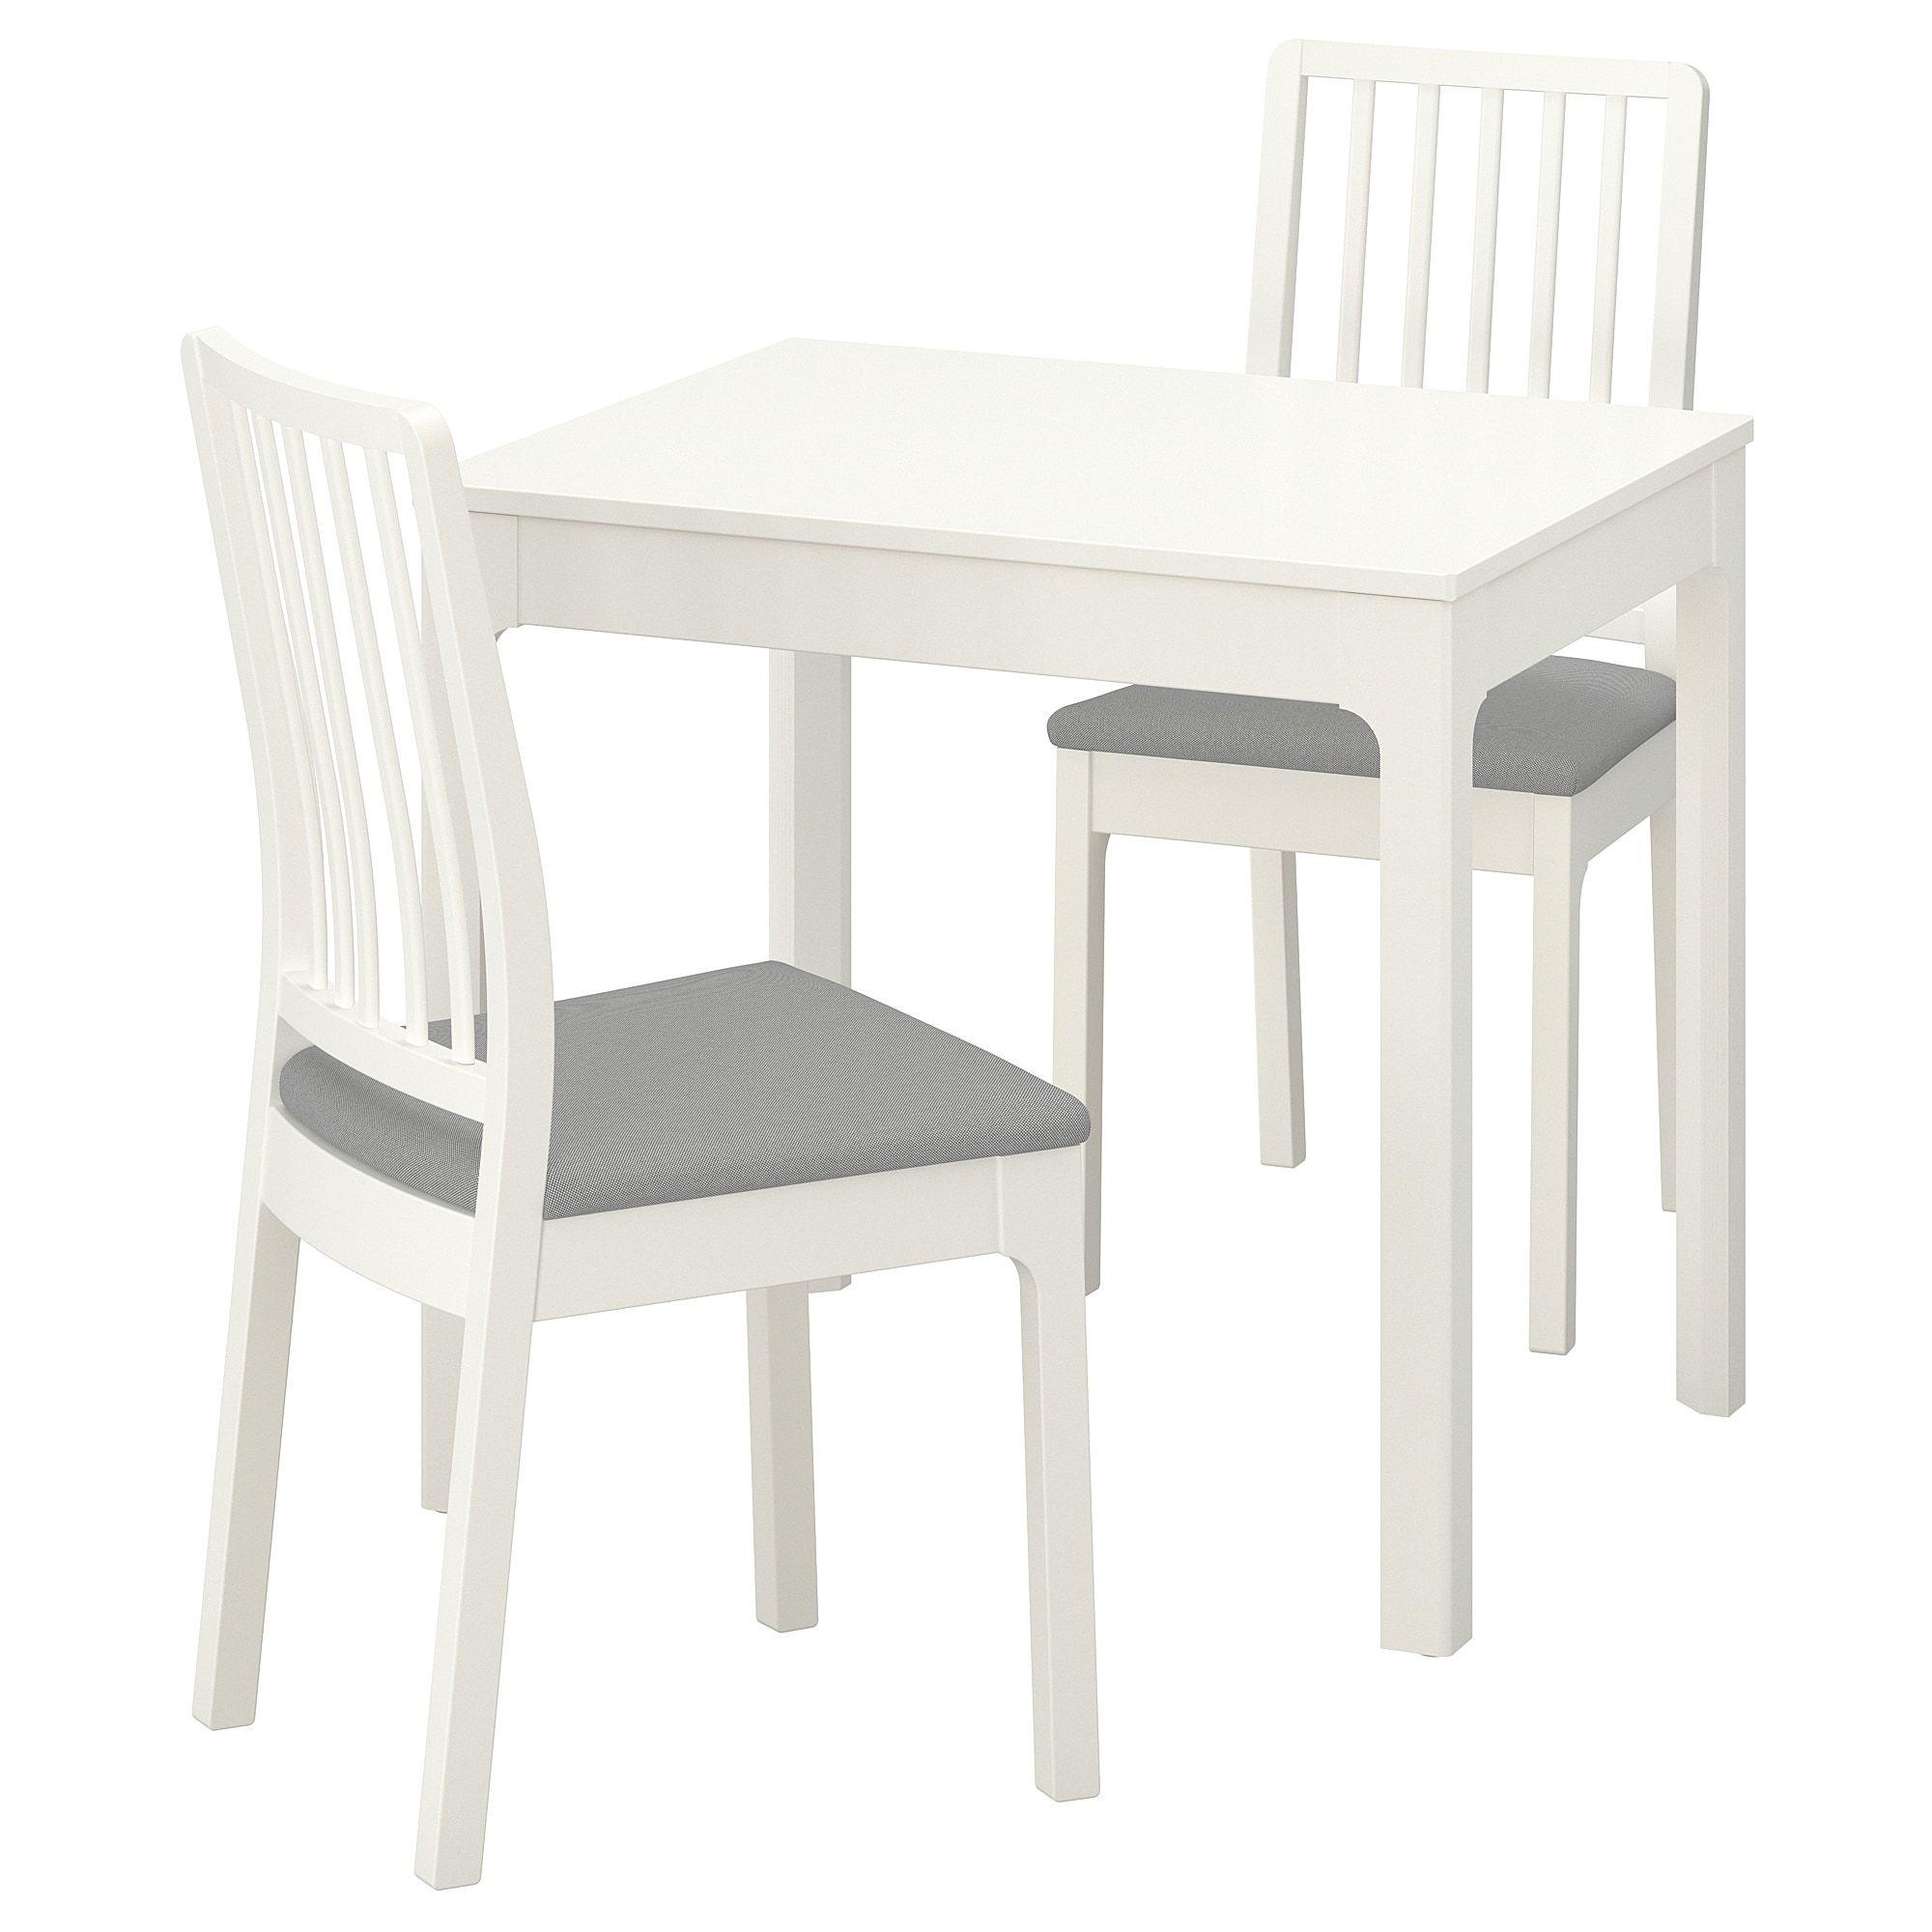 Ekedalen Ekedalen Table And 2 Chairs White Orrsta Light Gray